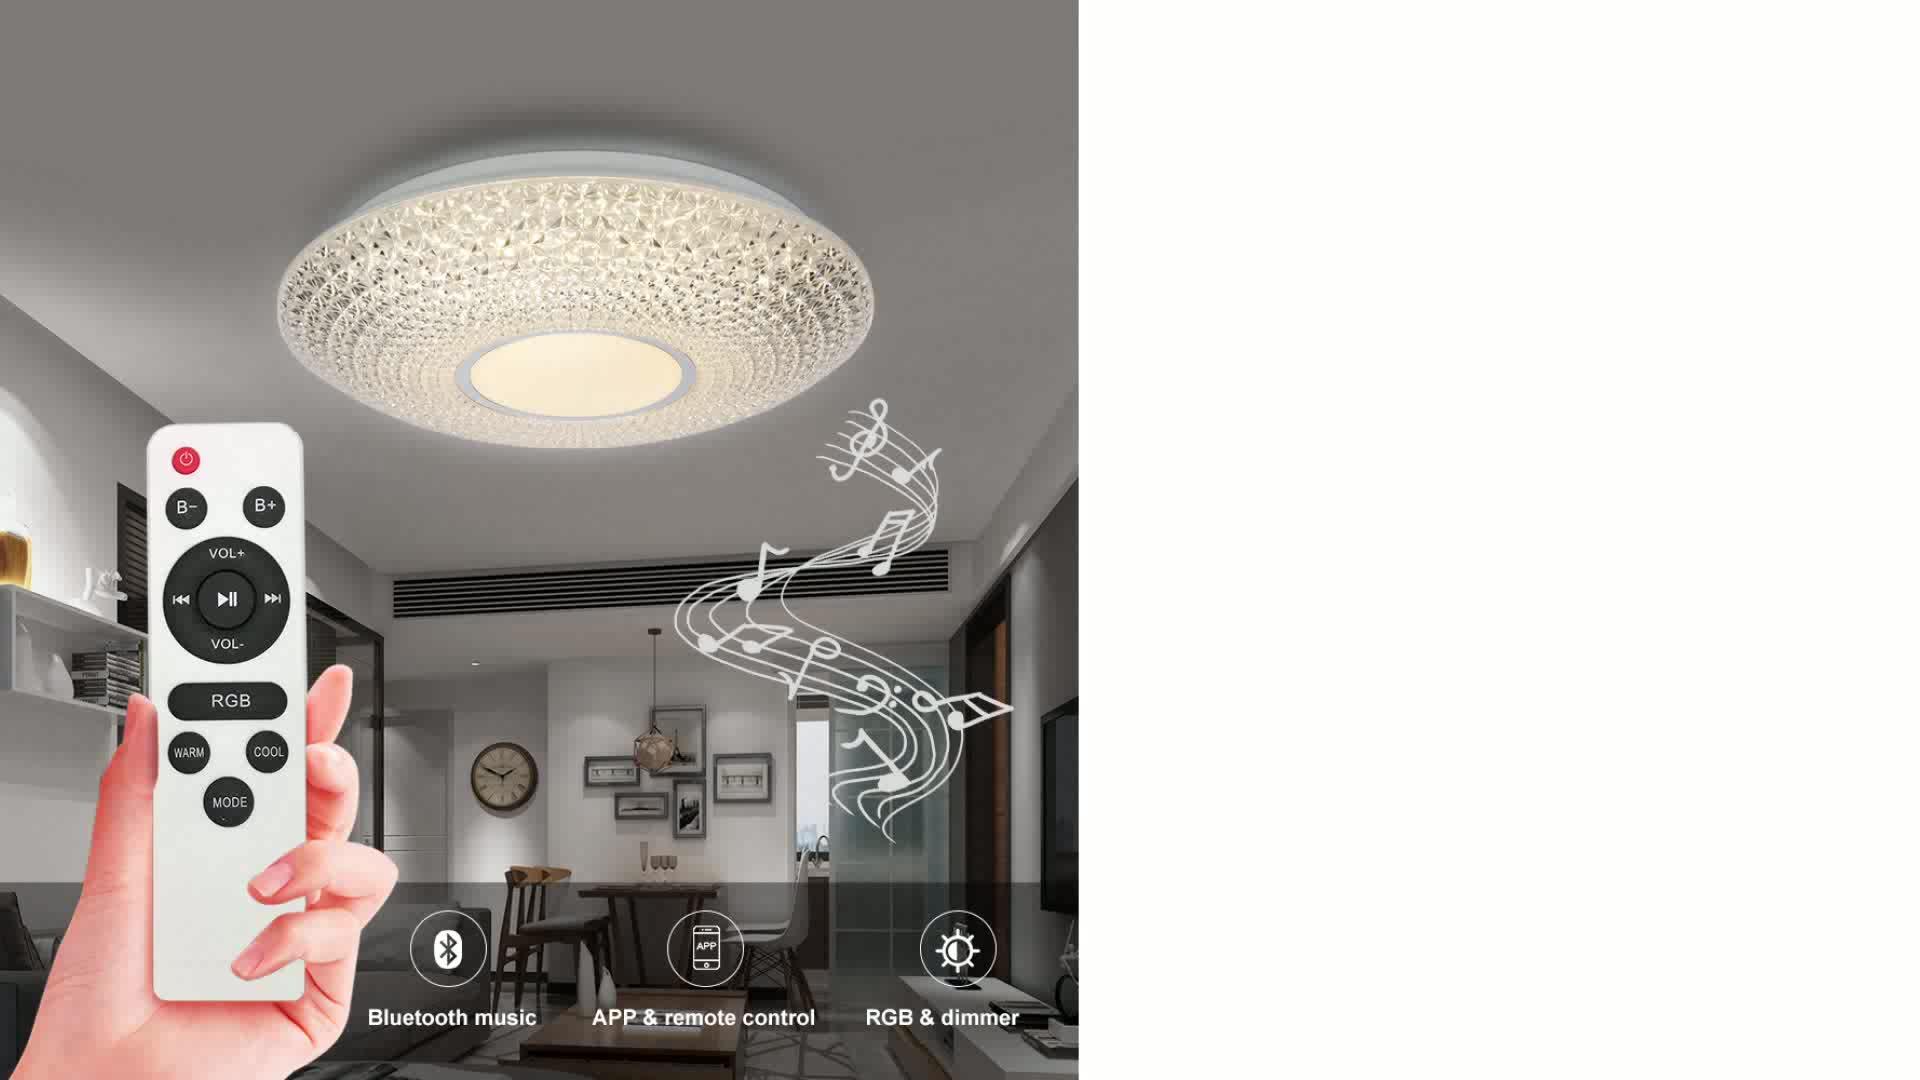 Afstandsbediening led plafondlamp met speaker mode wifi app controle bluetooth led plafond lamp 48W 60W 3000 -6500K